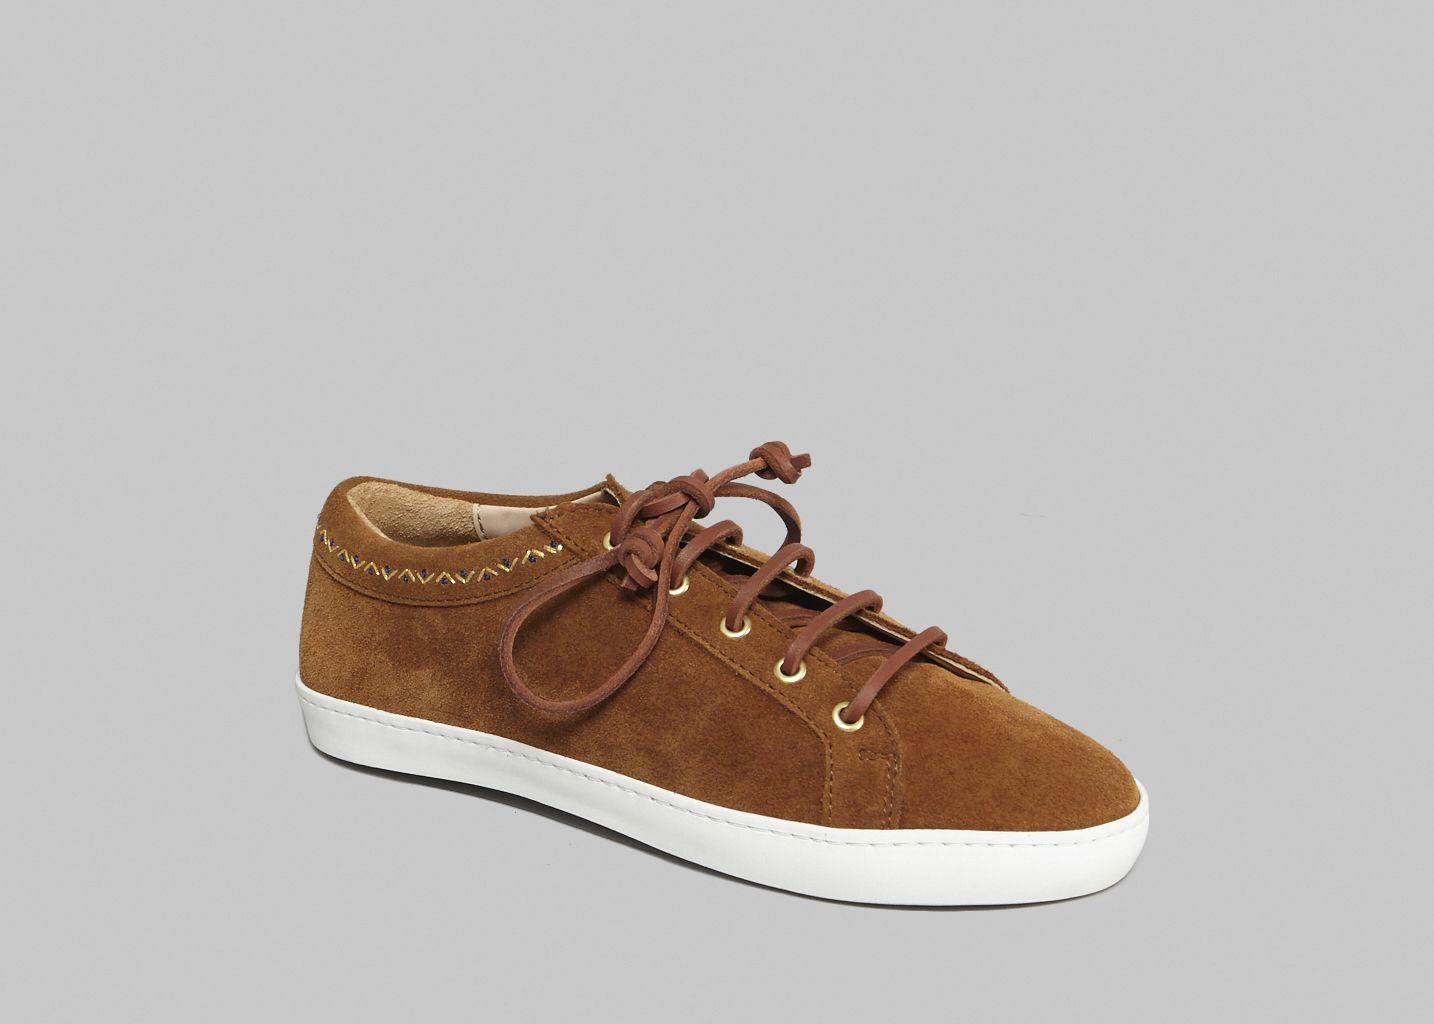 Sneakers La Carioca - Bobbies